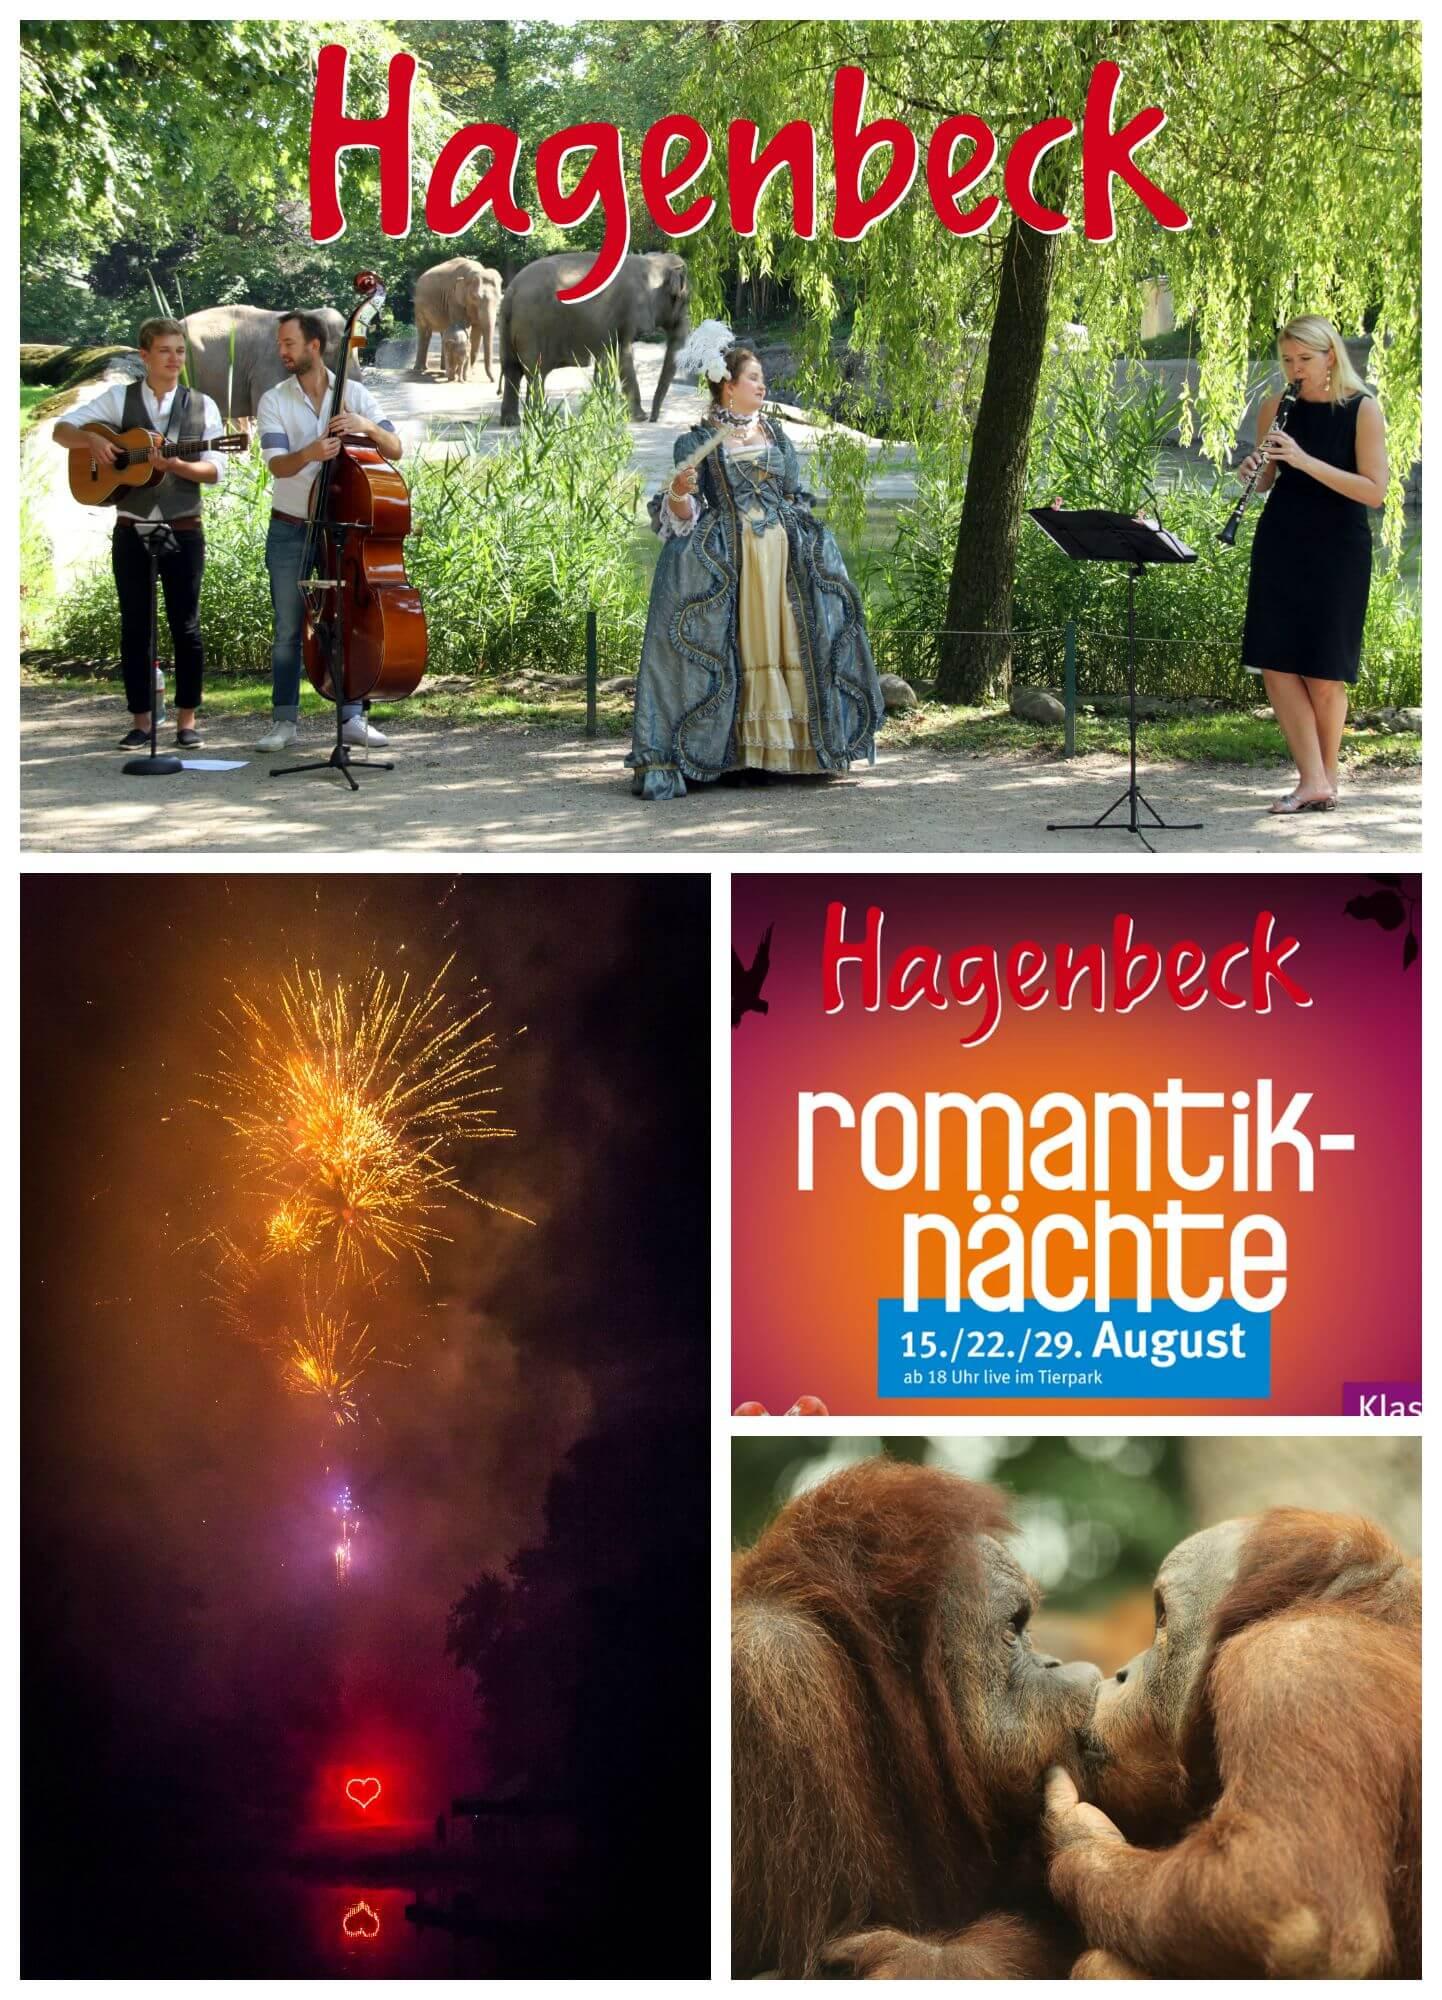 Nächte hagenbeck romantik Tierpark in